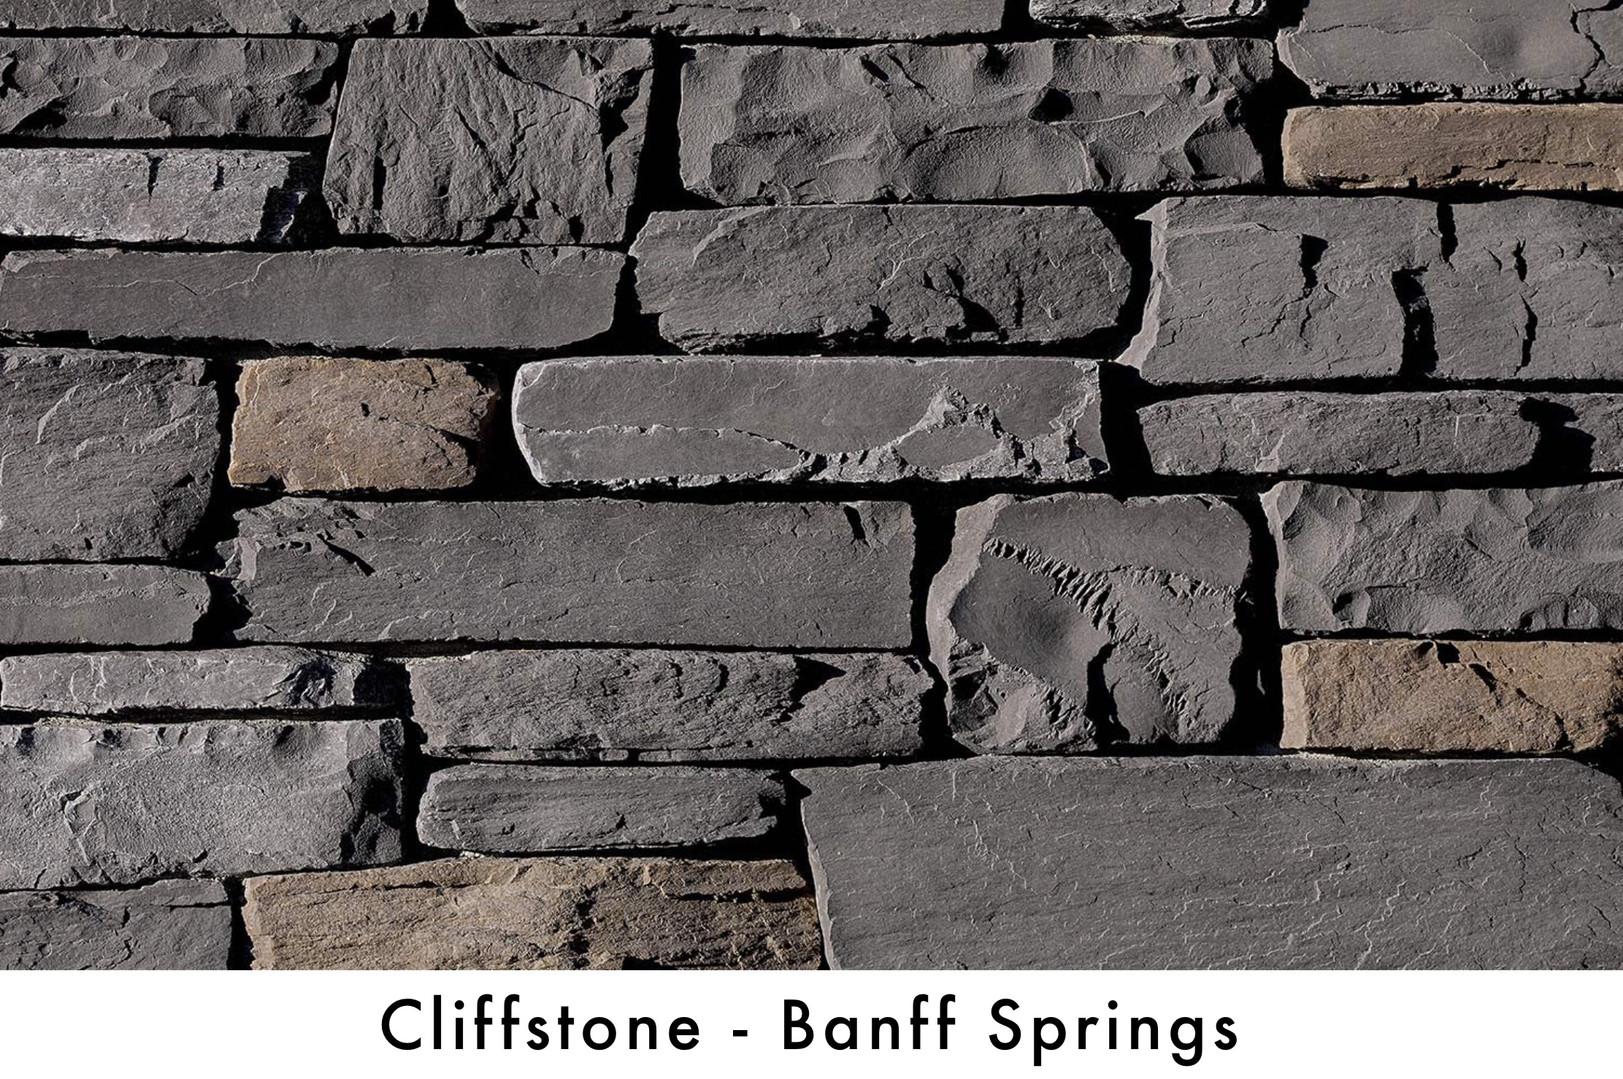 Cliffstone - Banff Springs